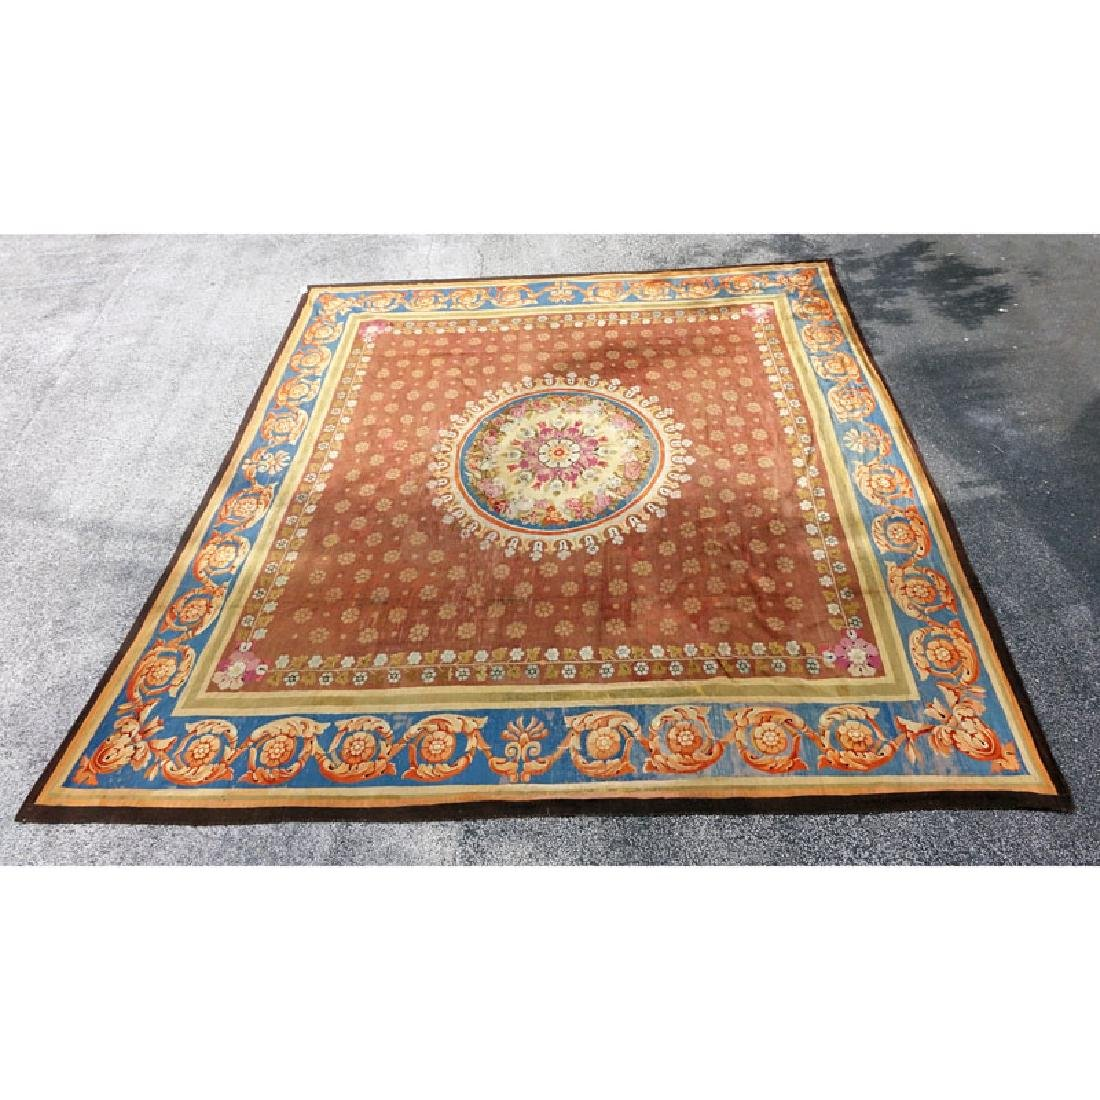 Large 19th Century French Aubusson Carpet.